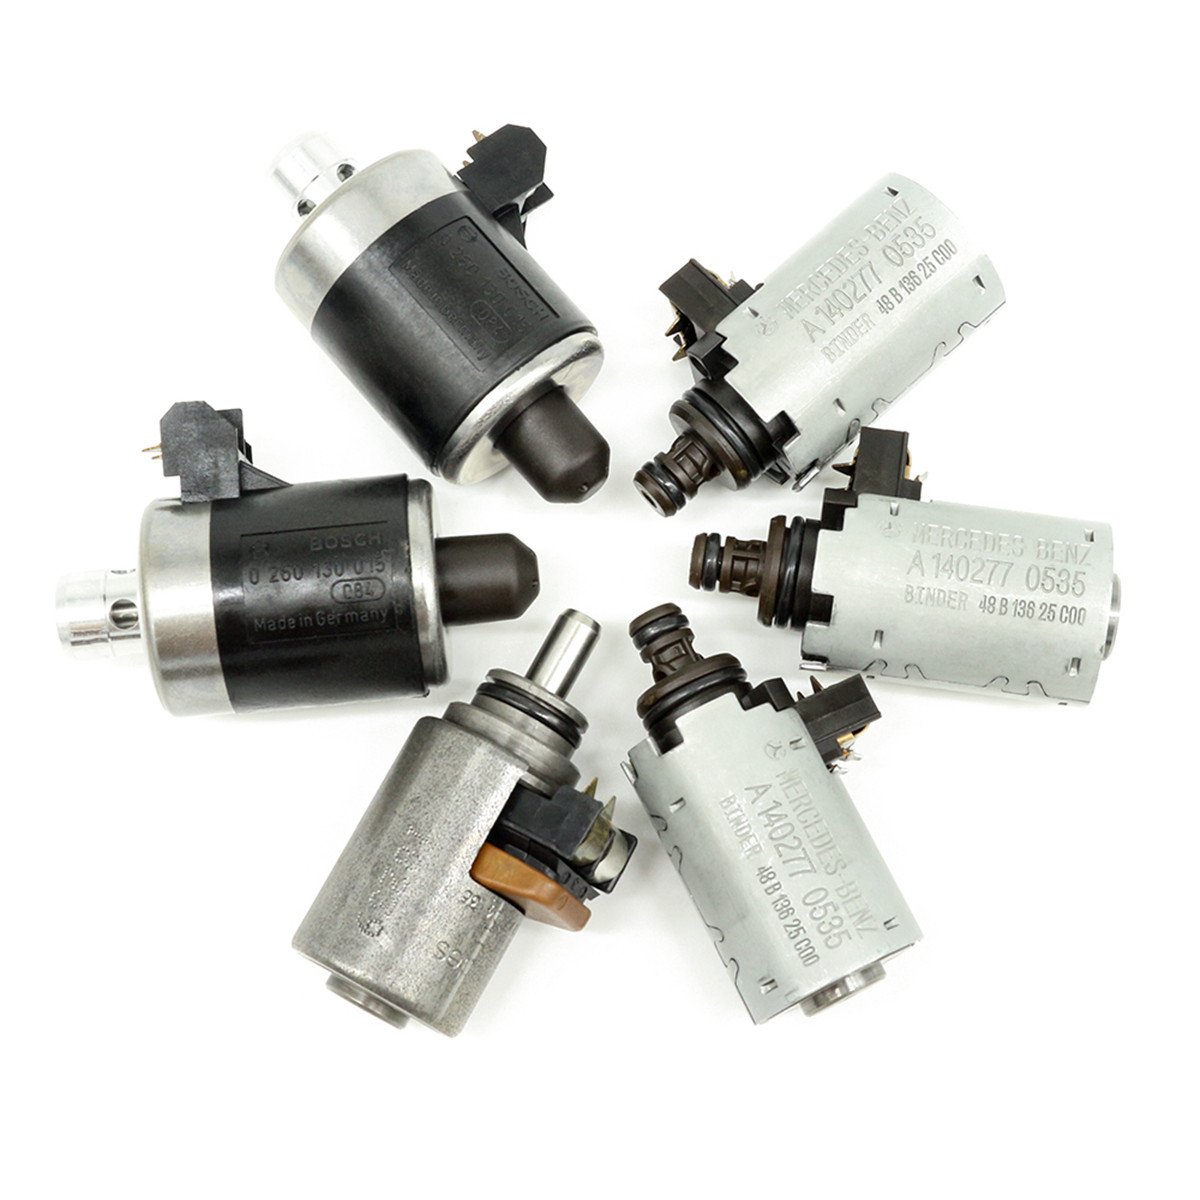 6pcs set transmission solenoids 722 6 spend sensor for mercedes benz automatic transmission solenoid 5  [ 1200 x 1200 Pixel ]